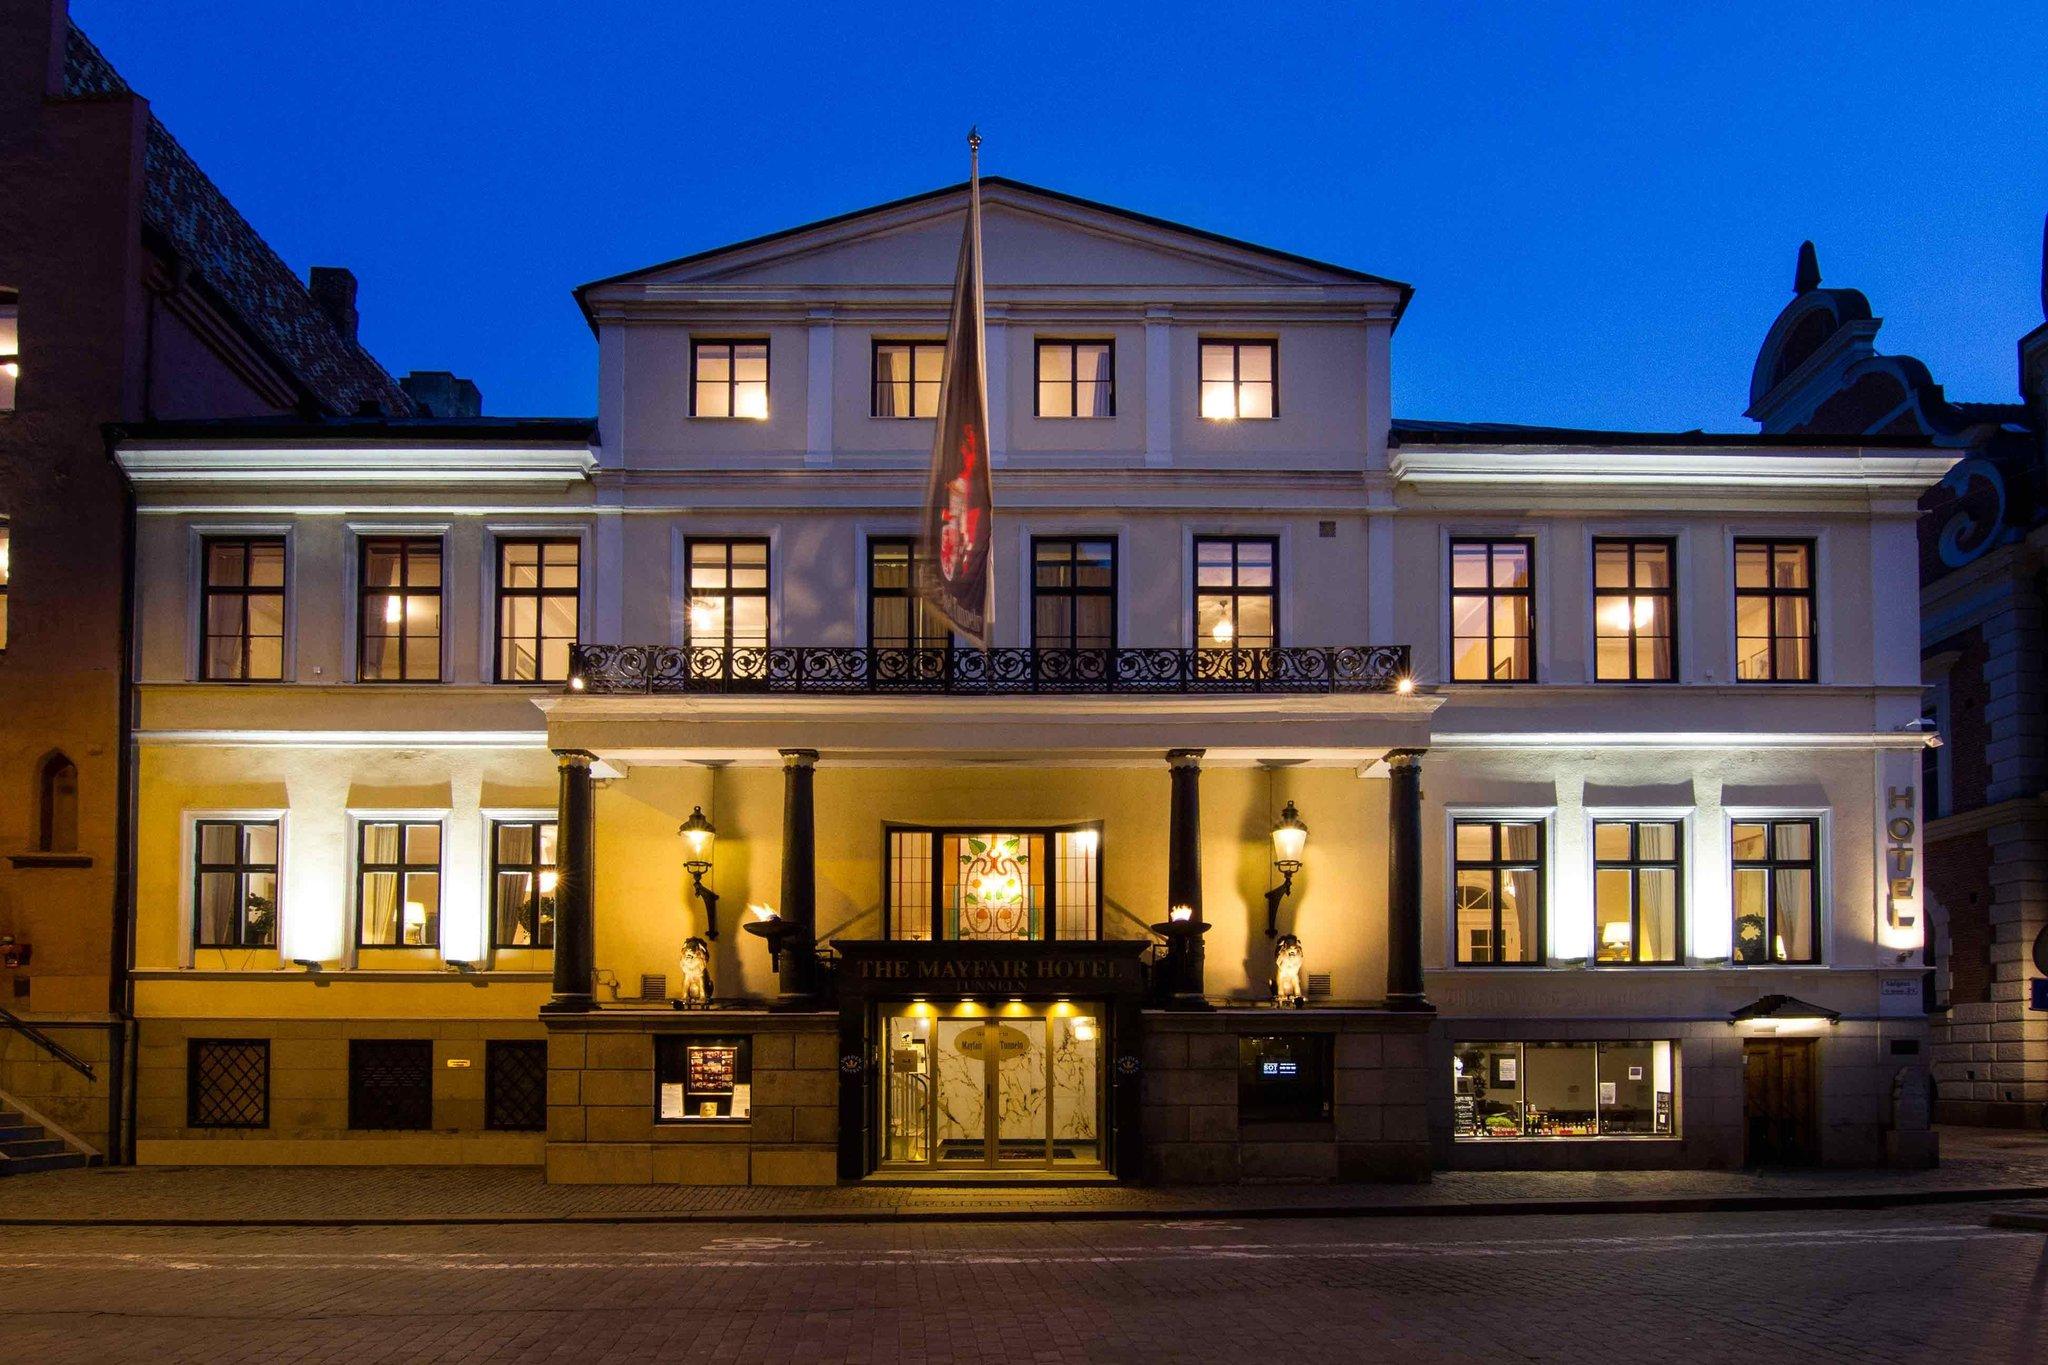 The Mayfair Hotel Malmo